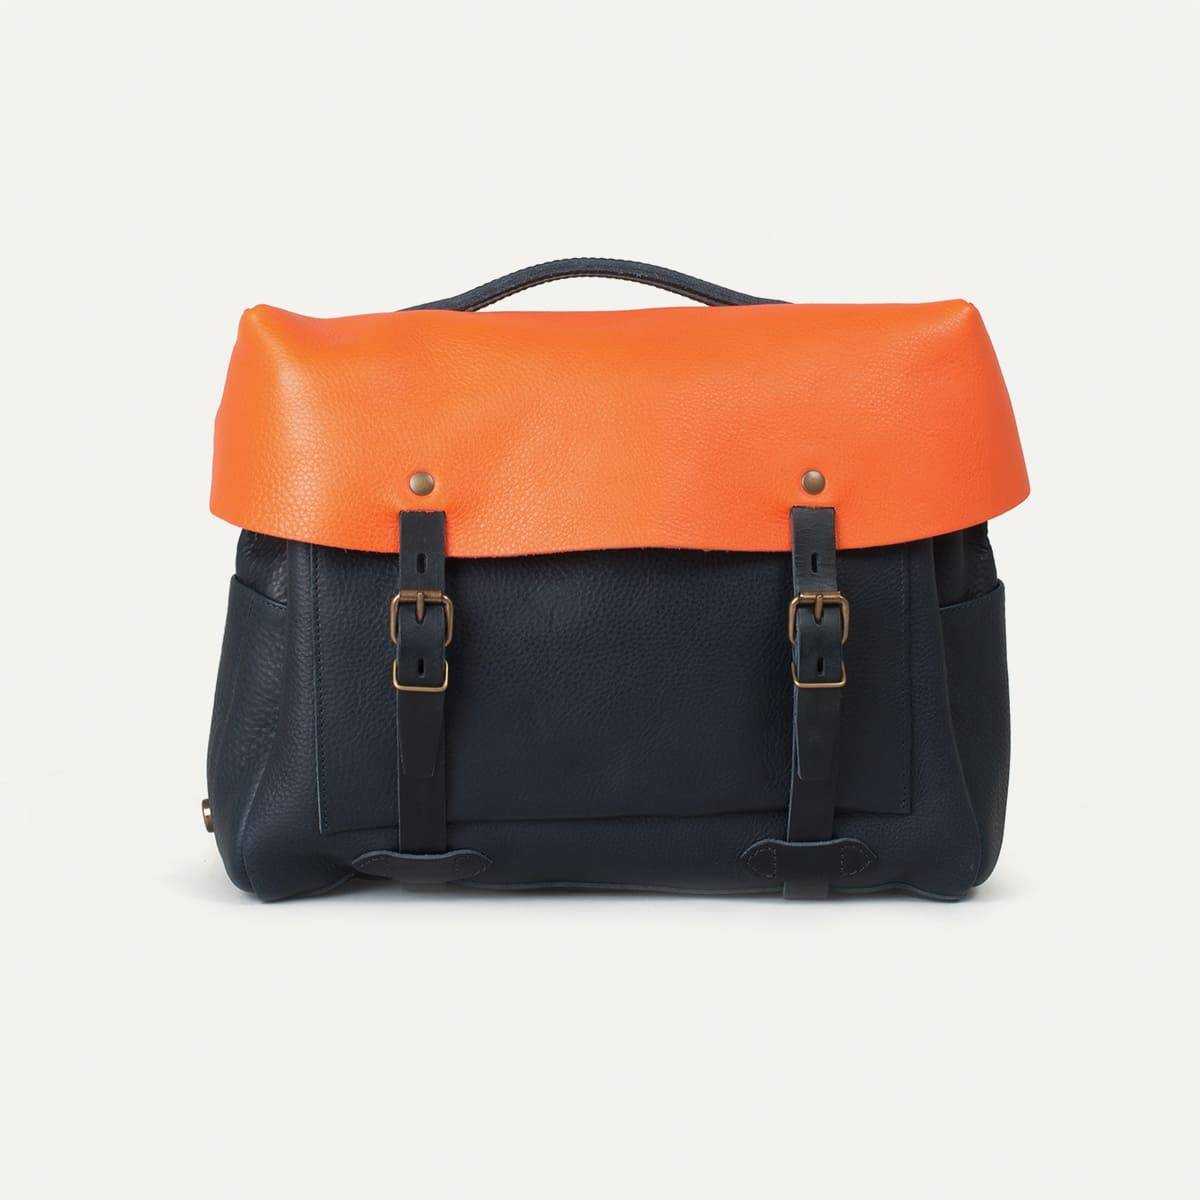 Bleu de Chauffe x Blitz Eclair bag - Navy/Orange (image n°3)